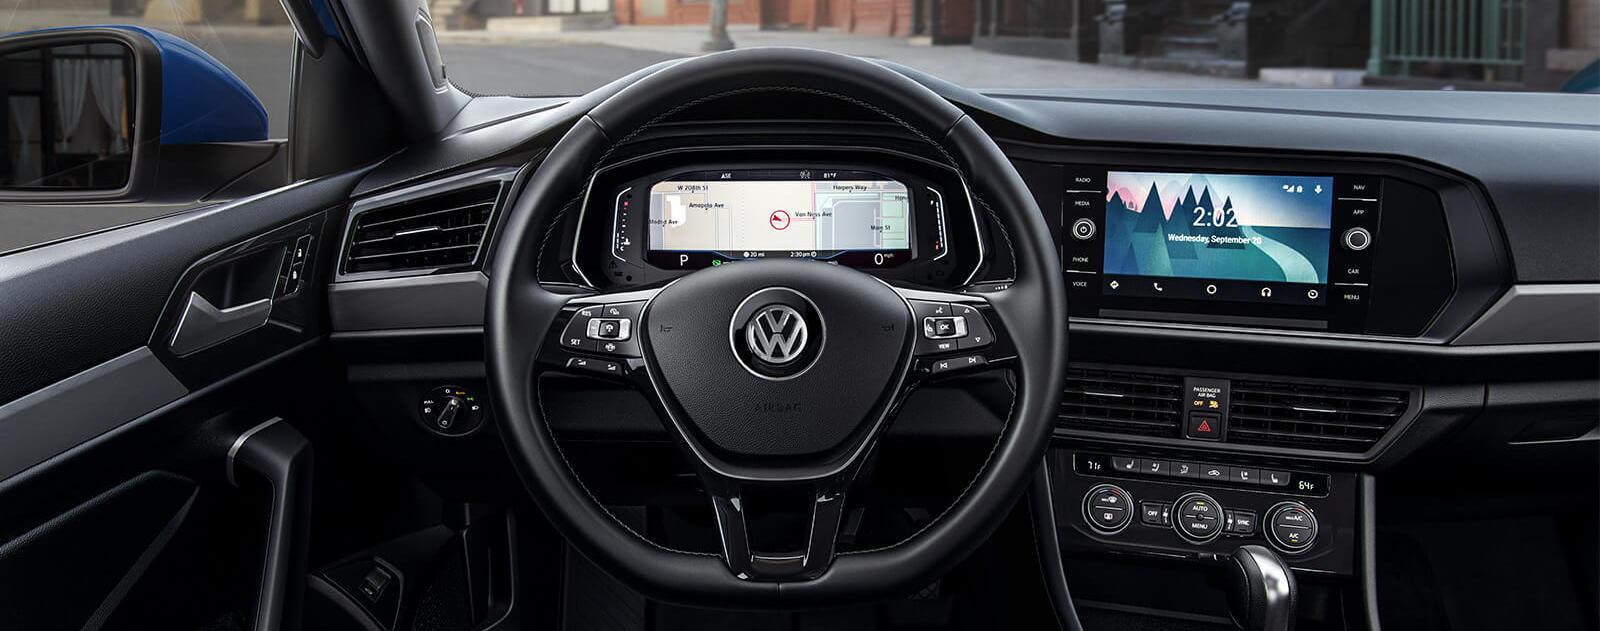 New 2019 Volkswagen Jetta digital gauge cluster & 8 inch touchscreen navigation